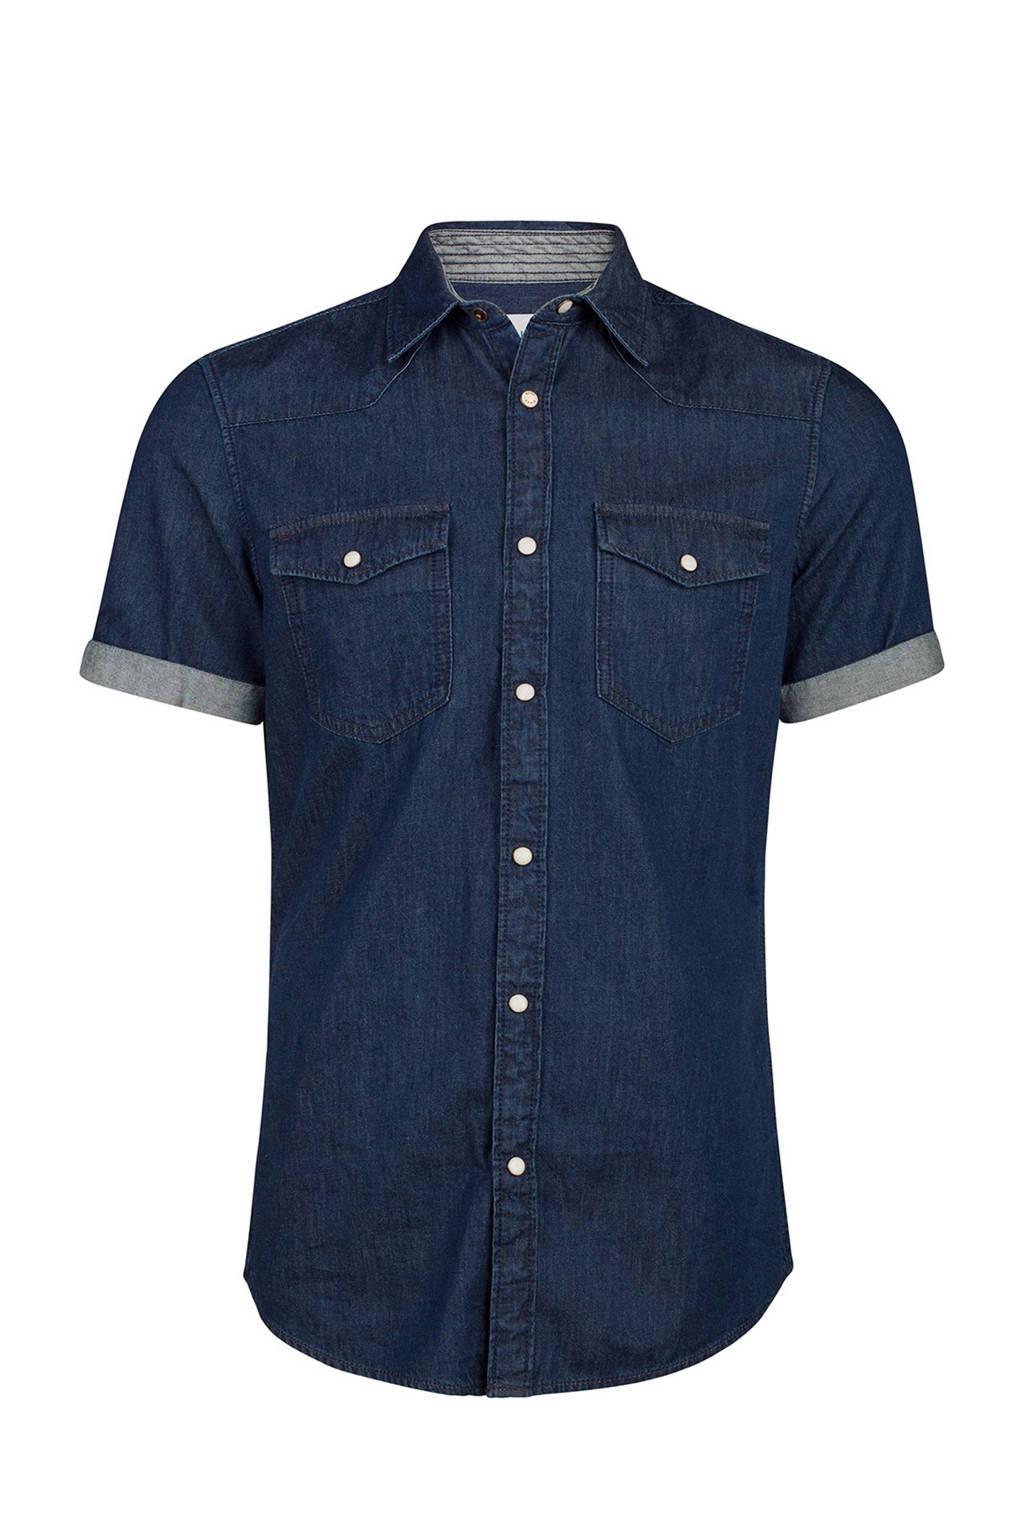 Slim Fit Denim Overhemd.We Fashion Blue Ridge Slim Fit Denim Overhemd Wehkamp